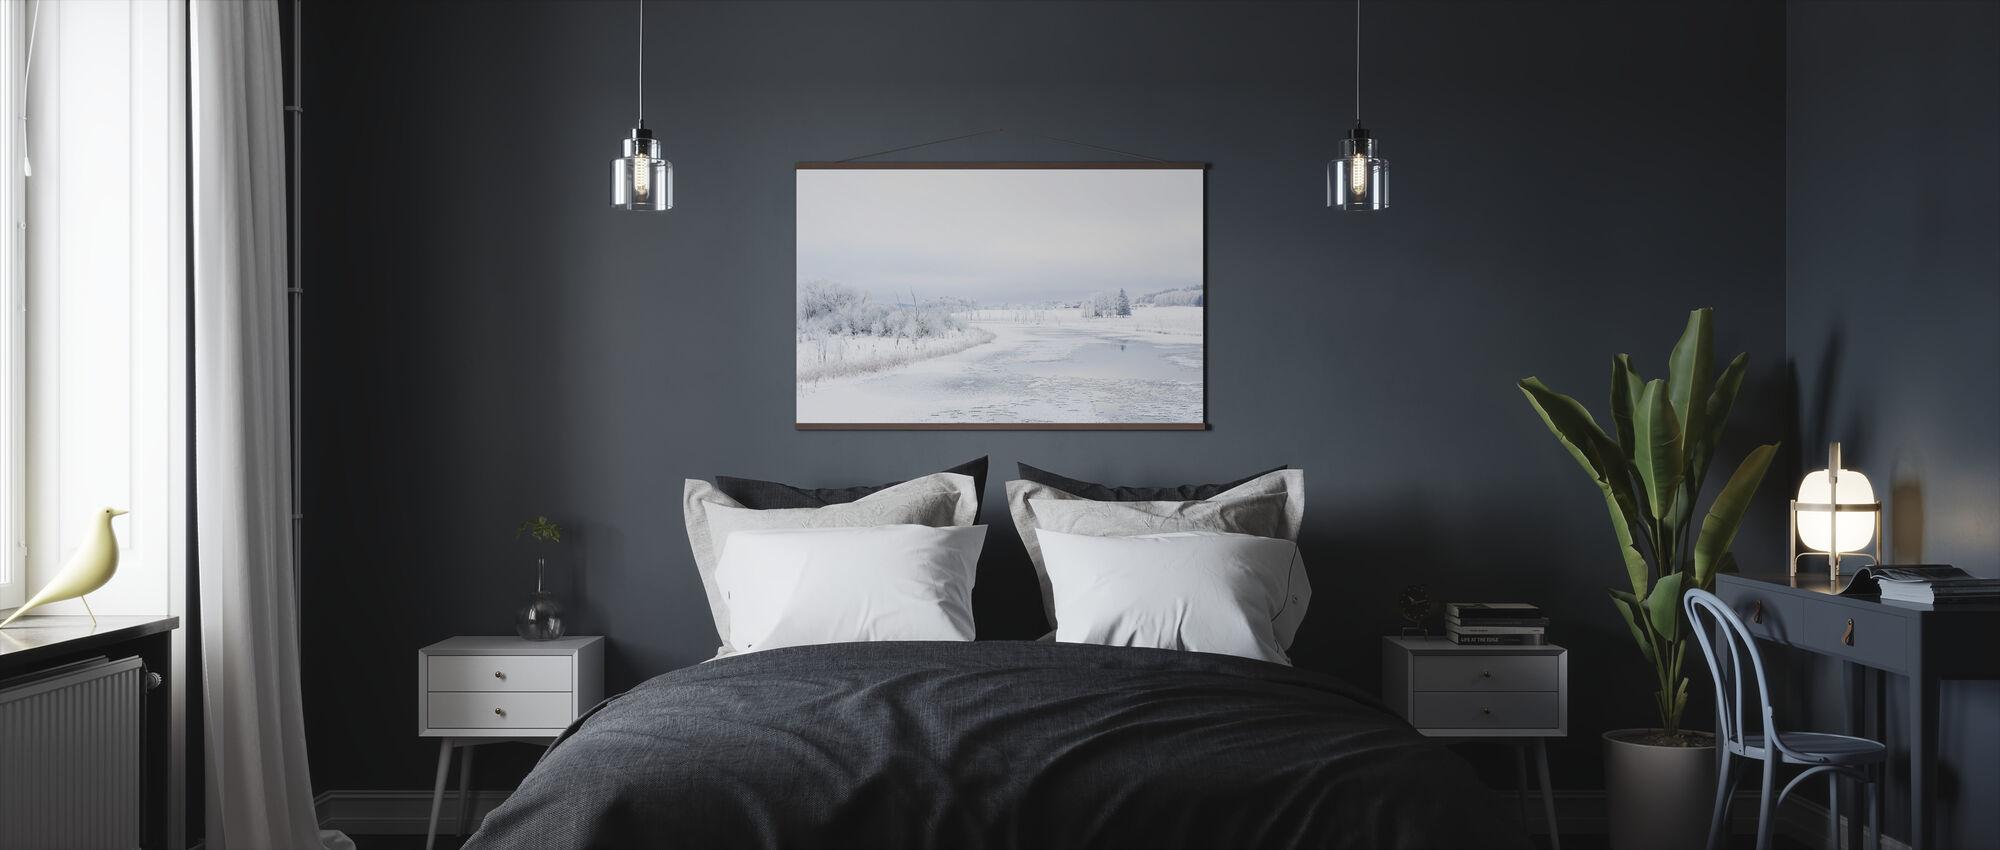 Svartån in Winter, Sweden - Poster - Bedroom